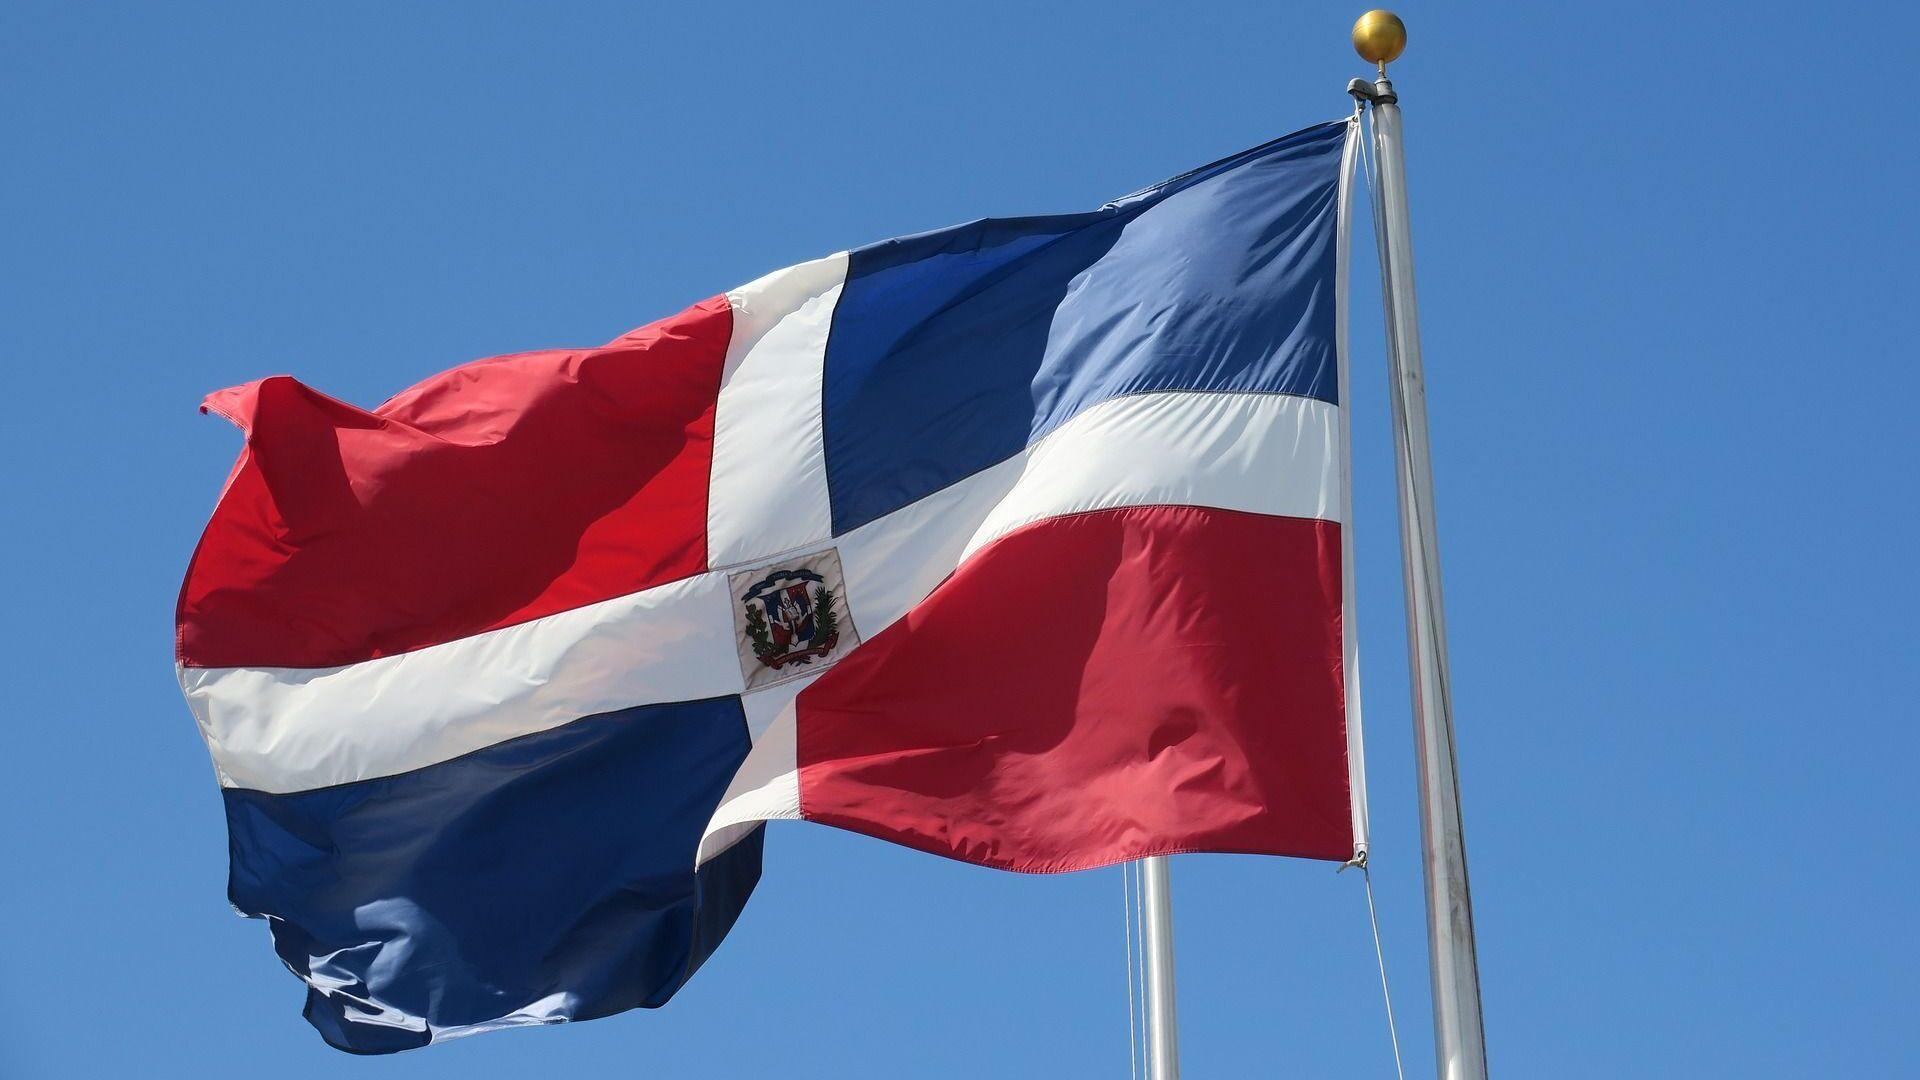 La bandera de la República Dominicana - Sputnik Mundo, 1920, 30.09.2021